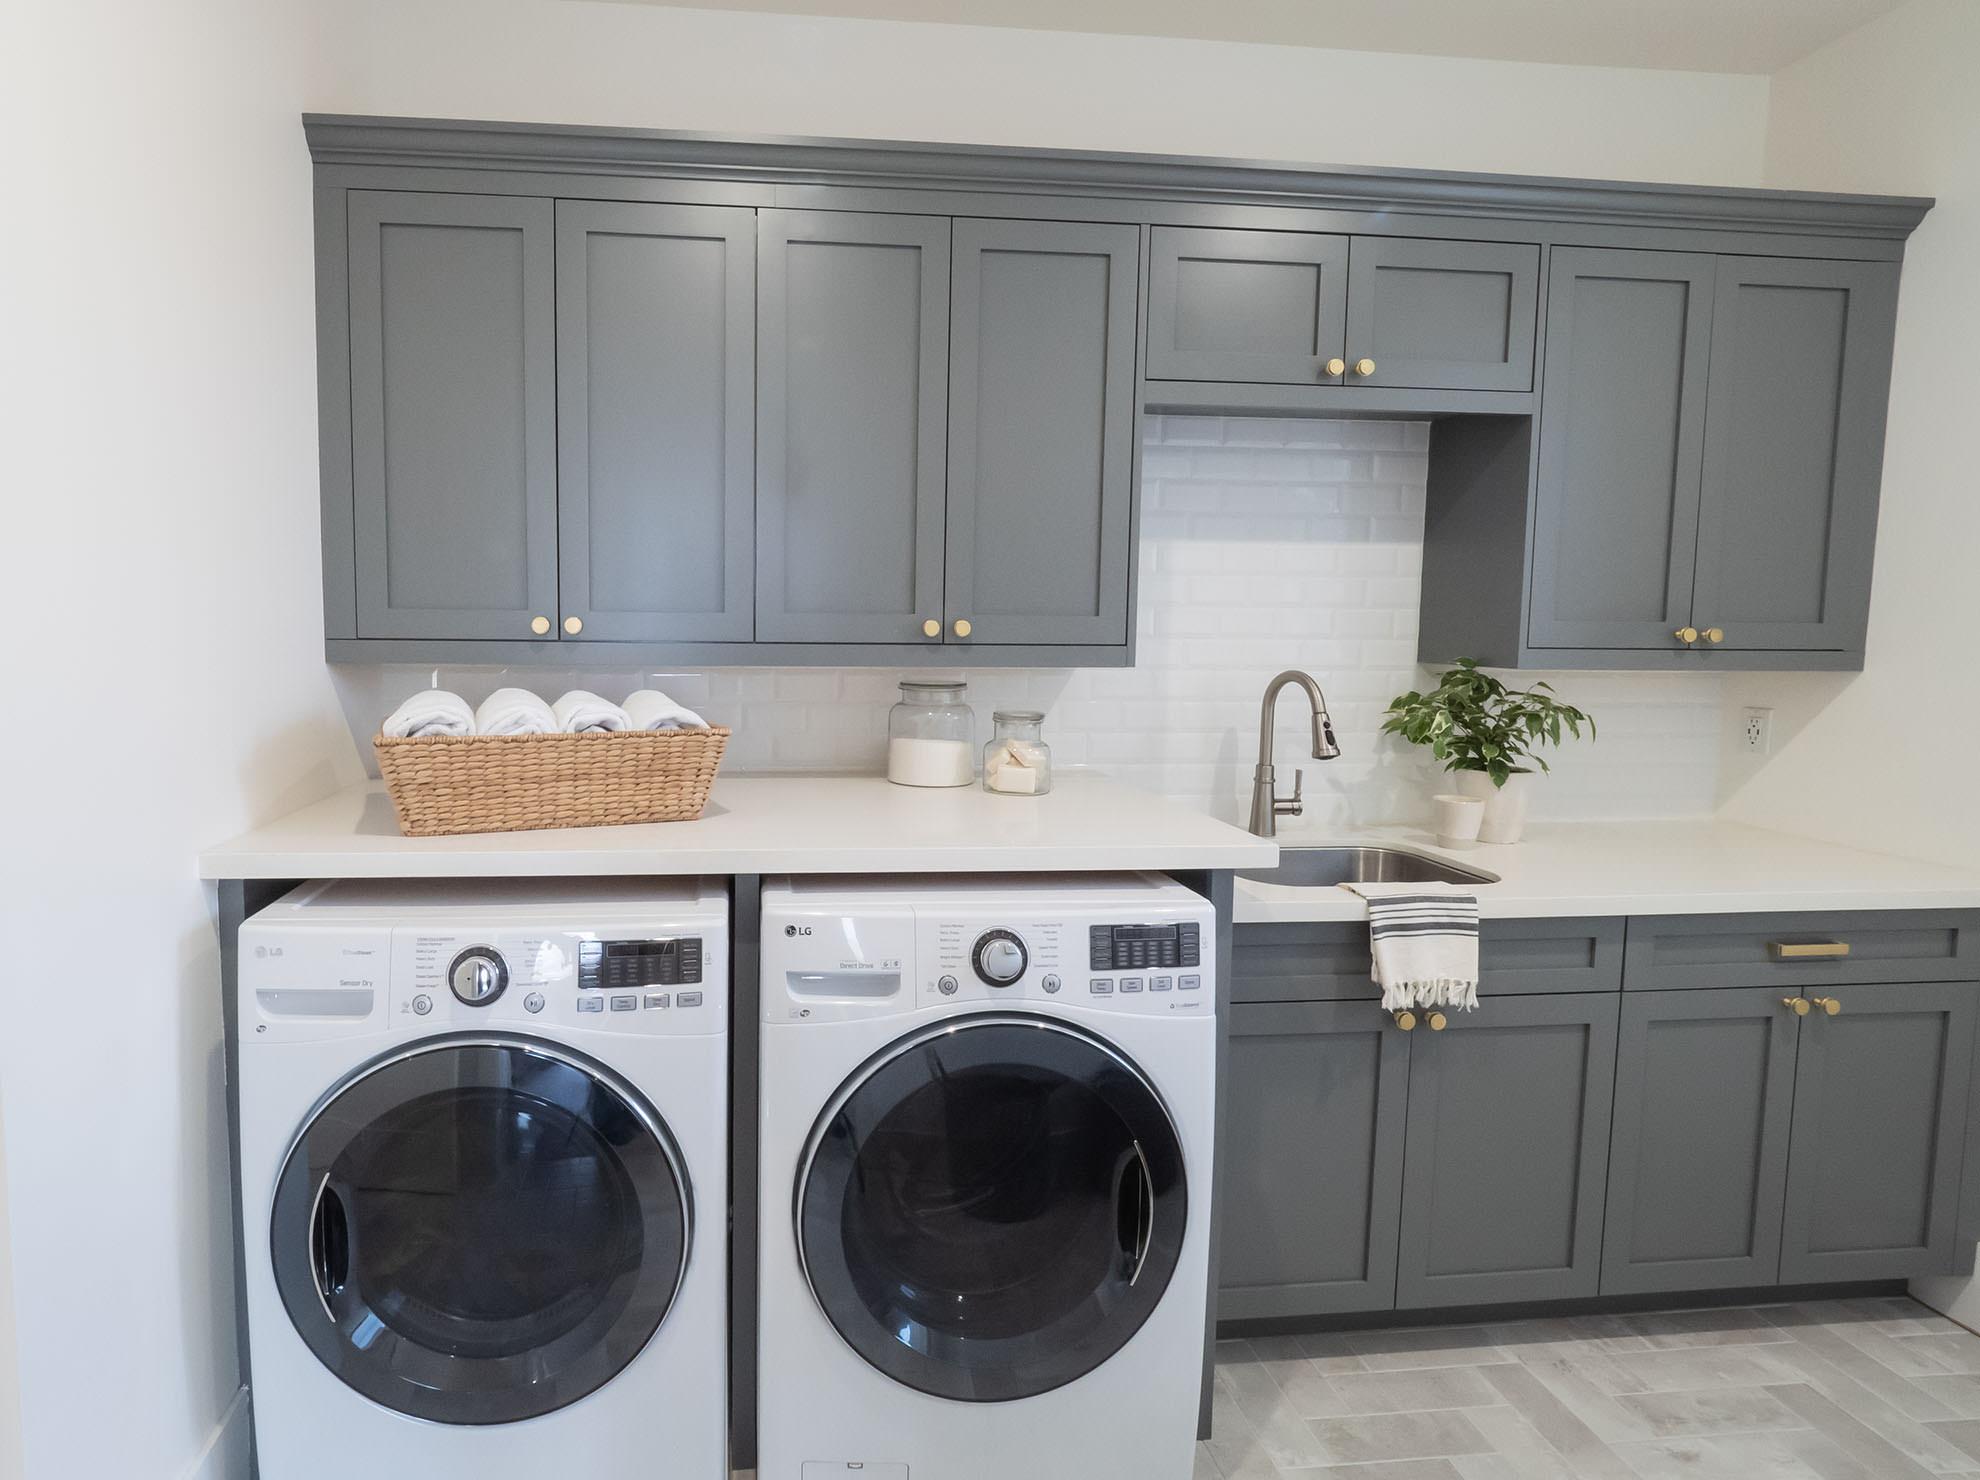 tnd-laundry-1010135.jpg